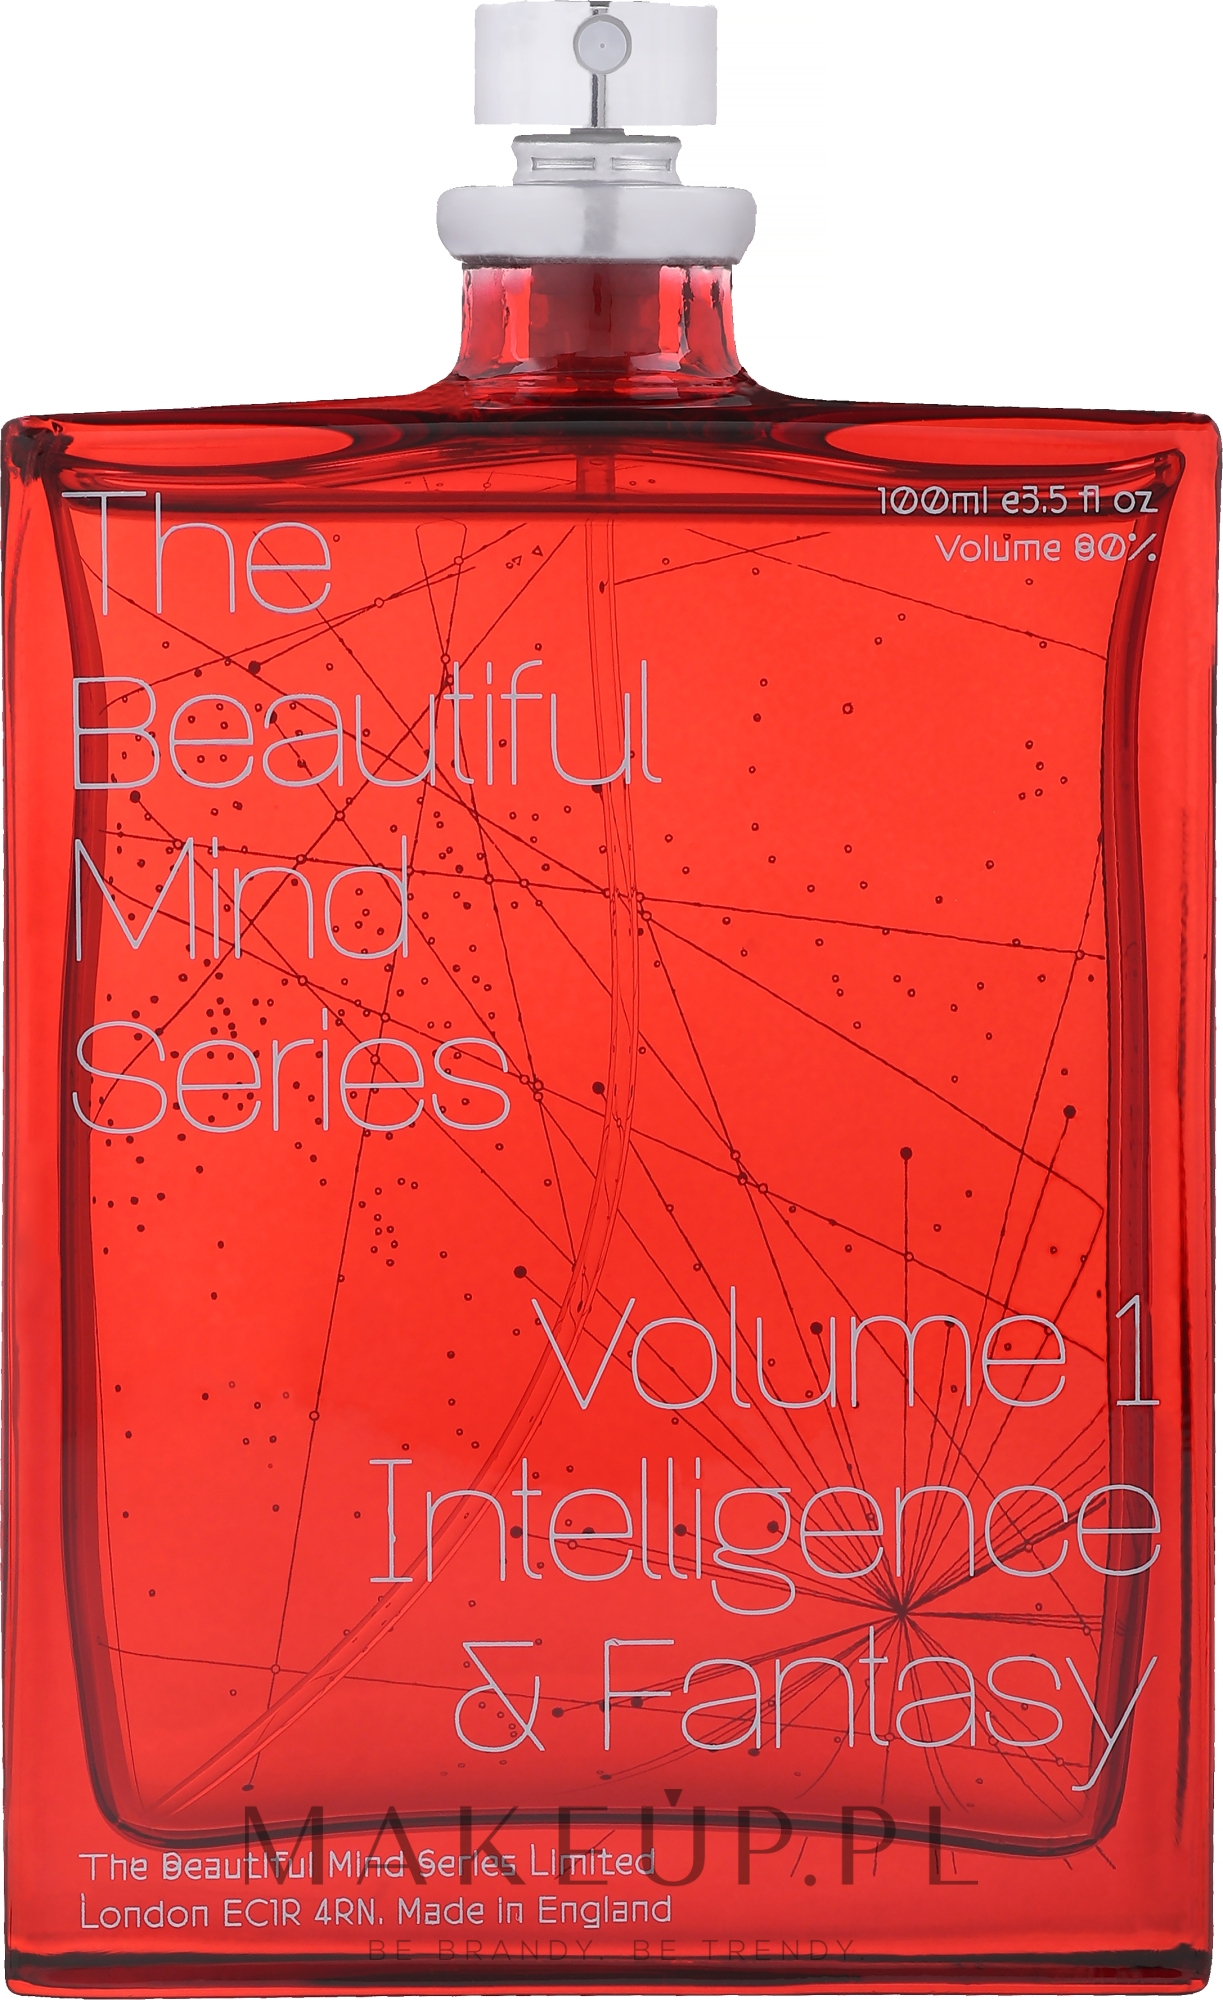 the beautiful mind series volume 1 - intelligence & fantasy